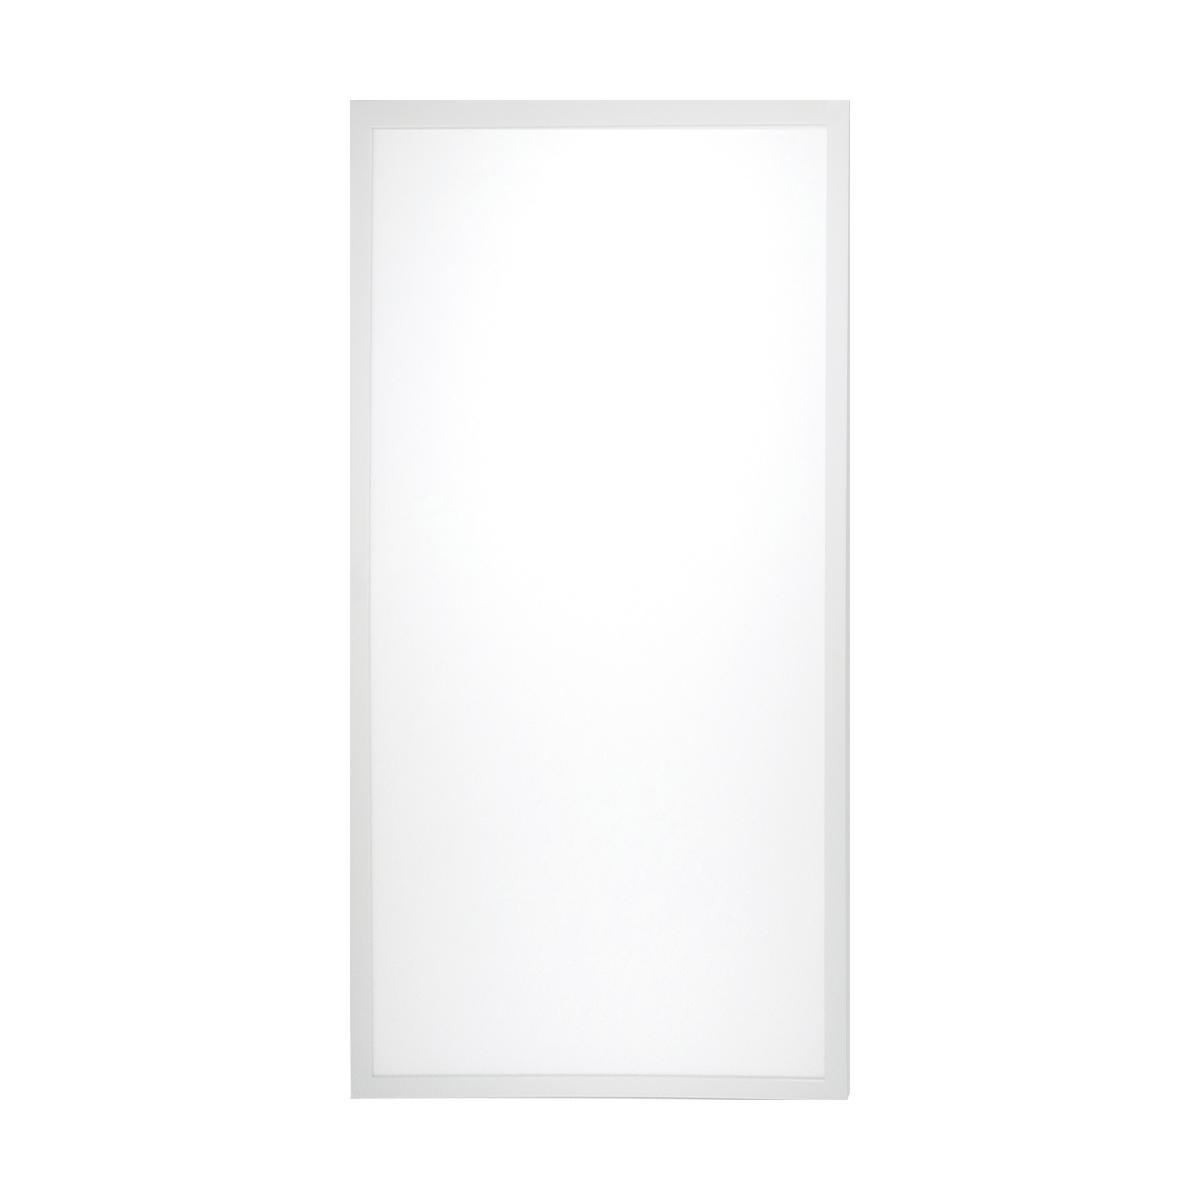 65-582 2X4 LED BACKLIT FLAT PANEL